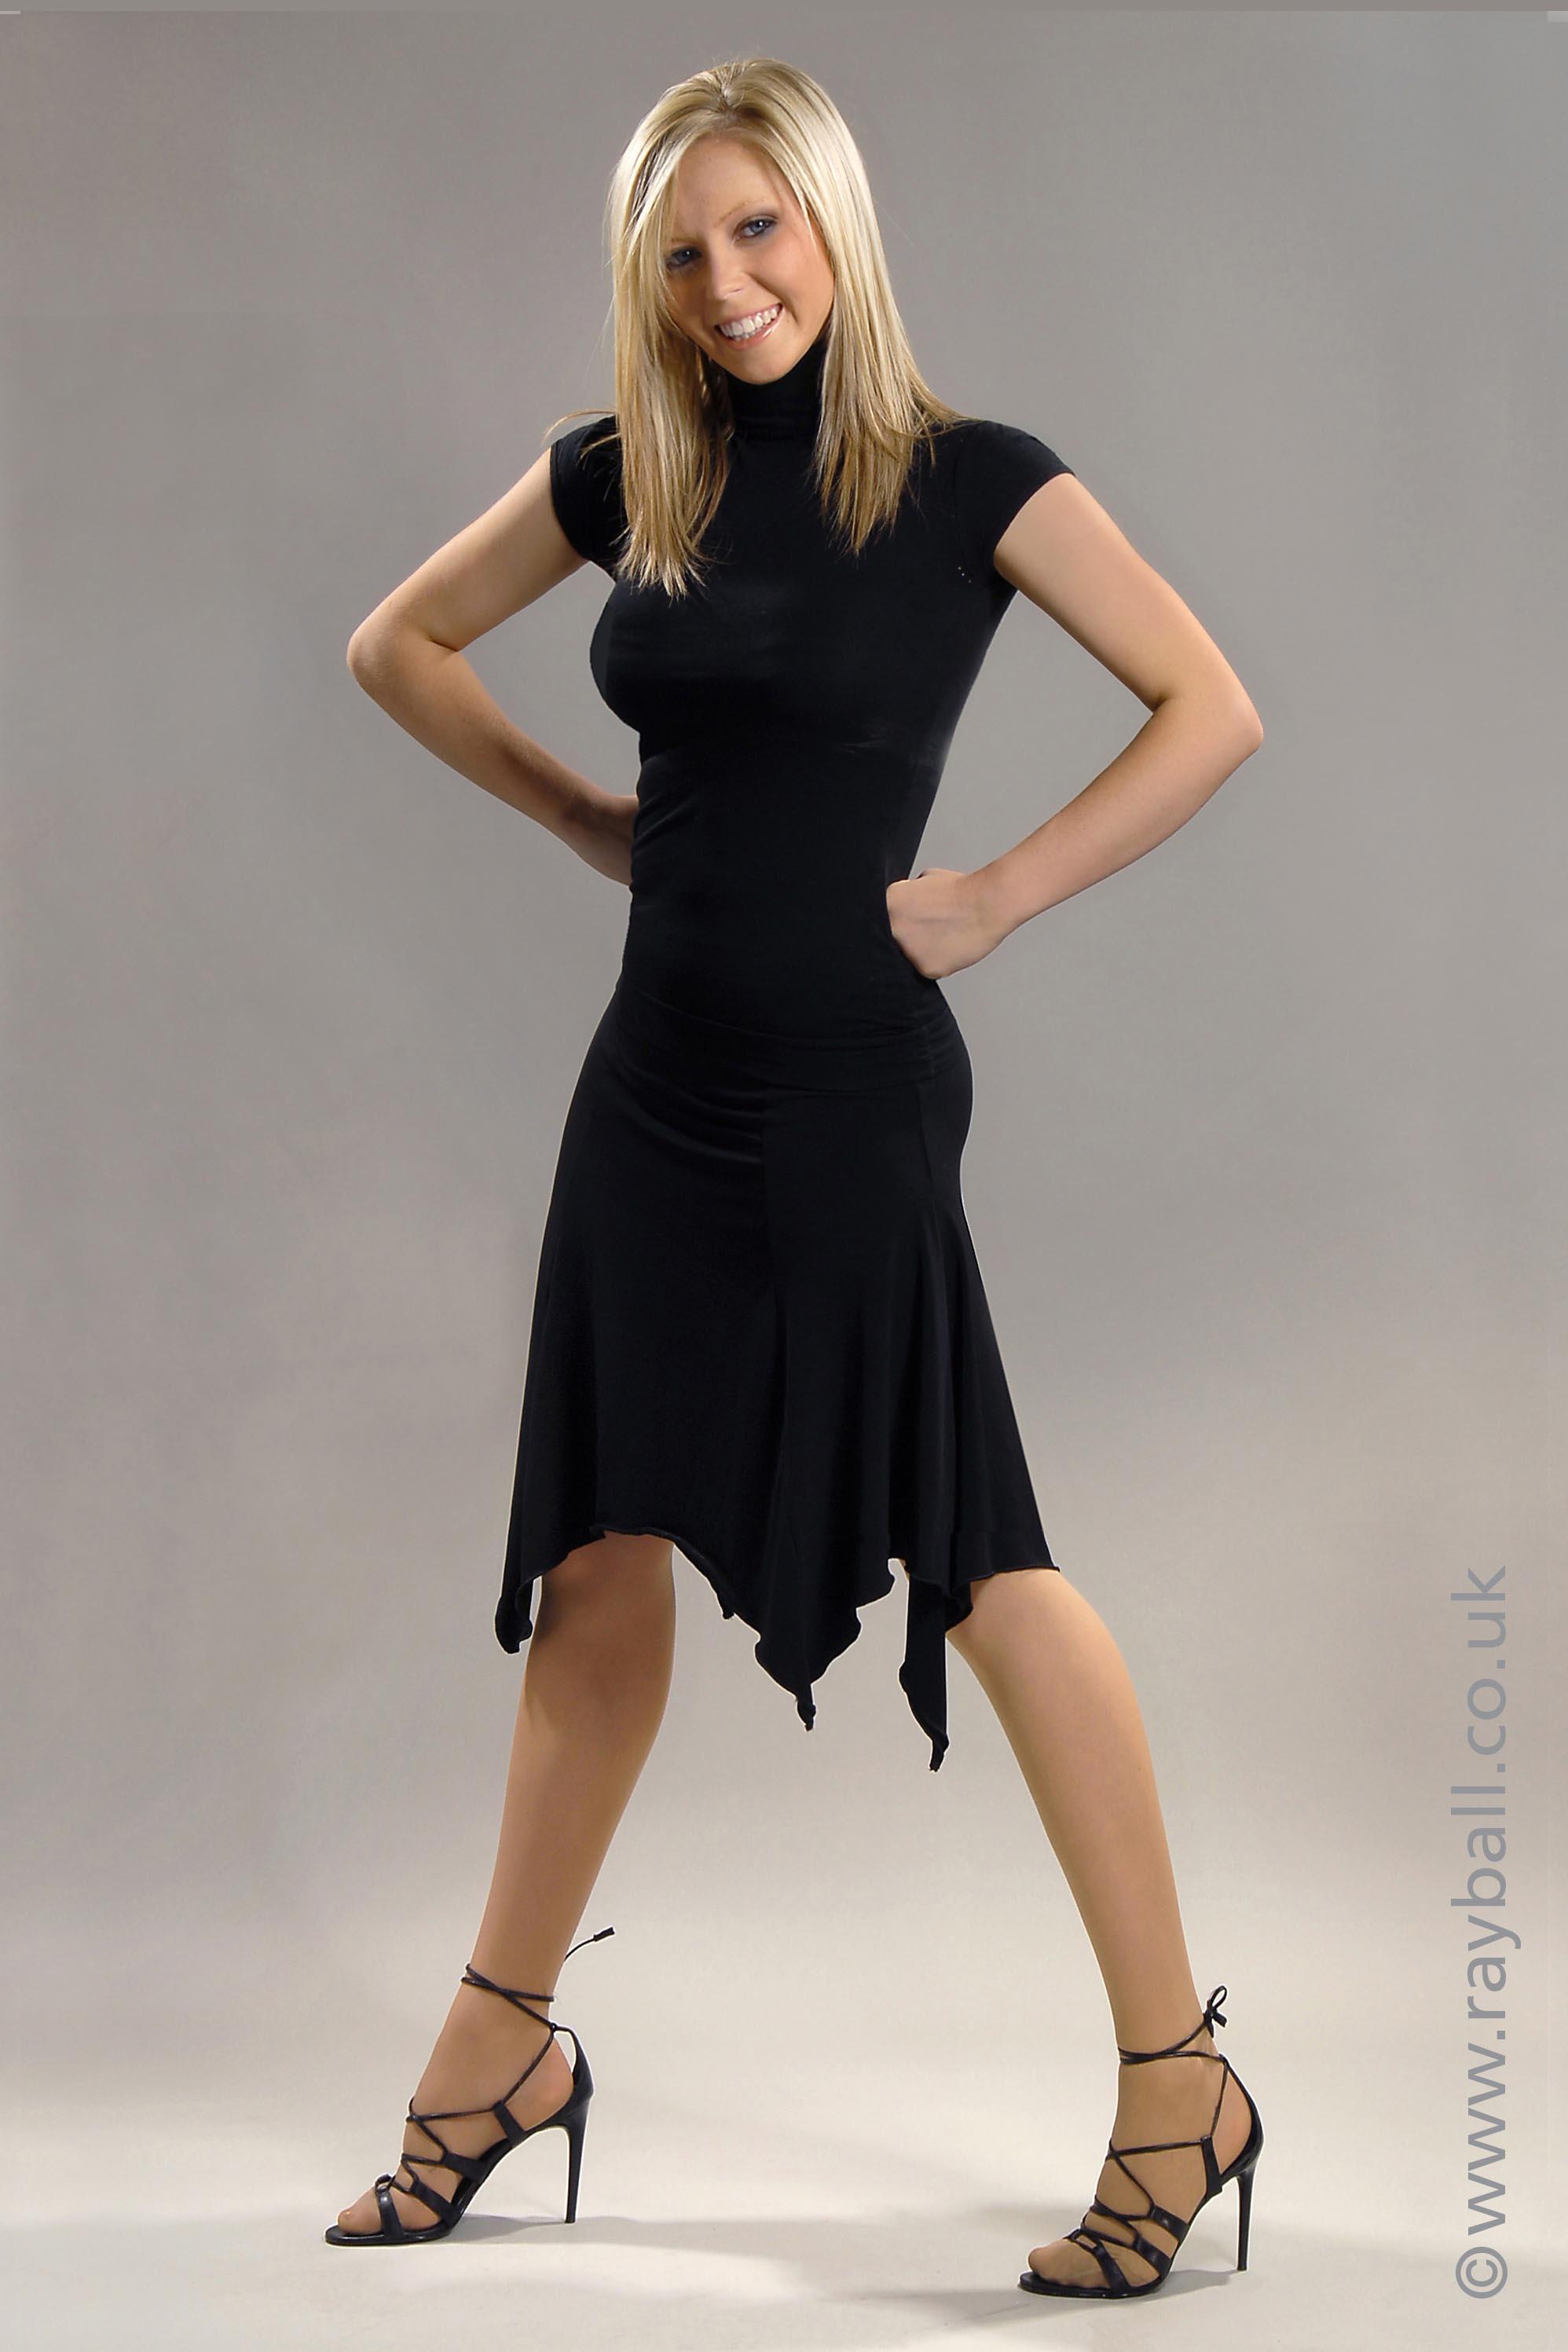 Stoneleigh model, banstead fashion at Epsom Photography Studio Epsom